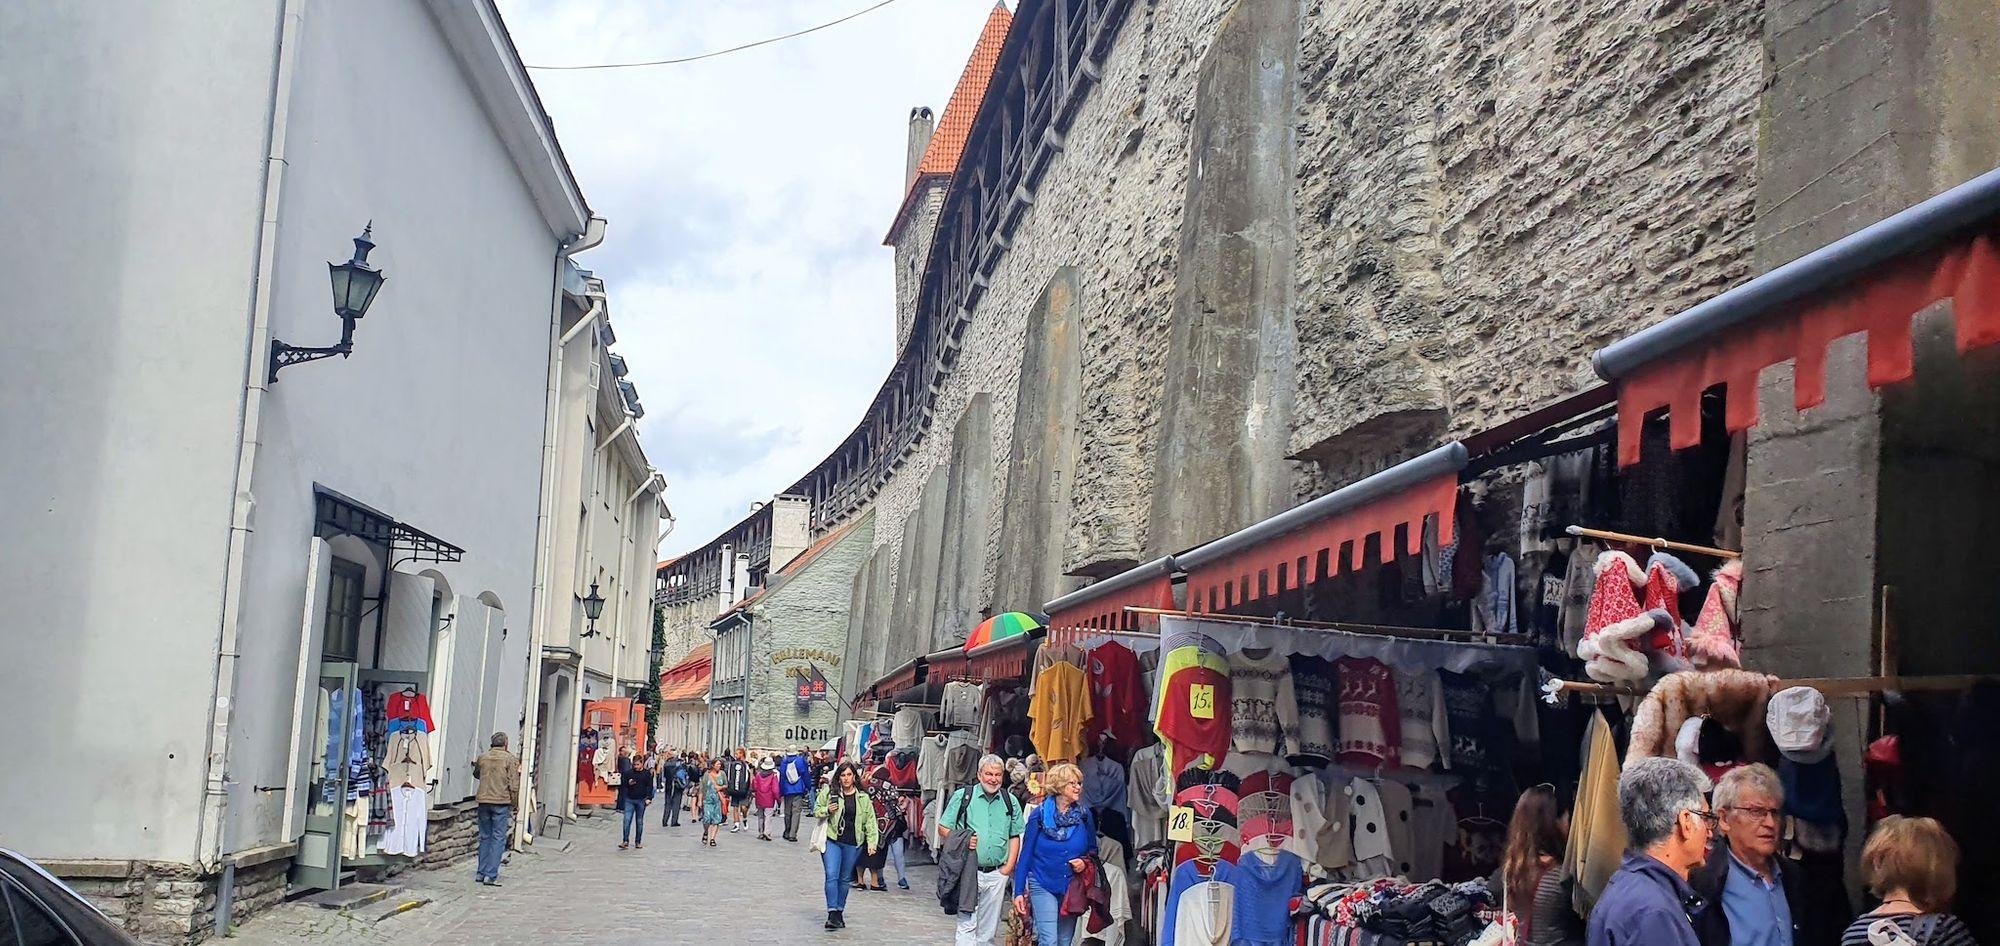 Otra vista de la muralla de Tallinn